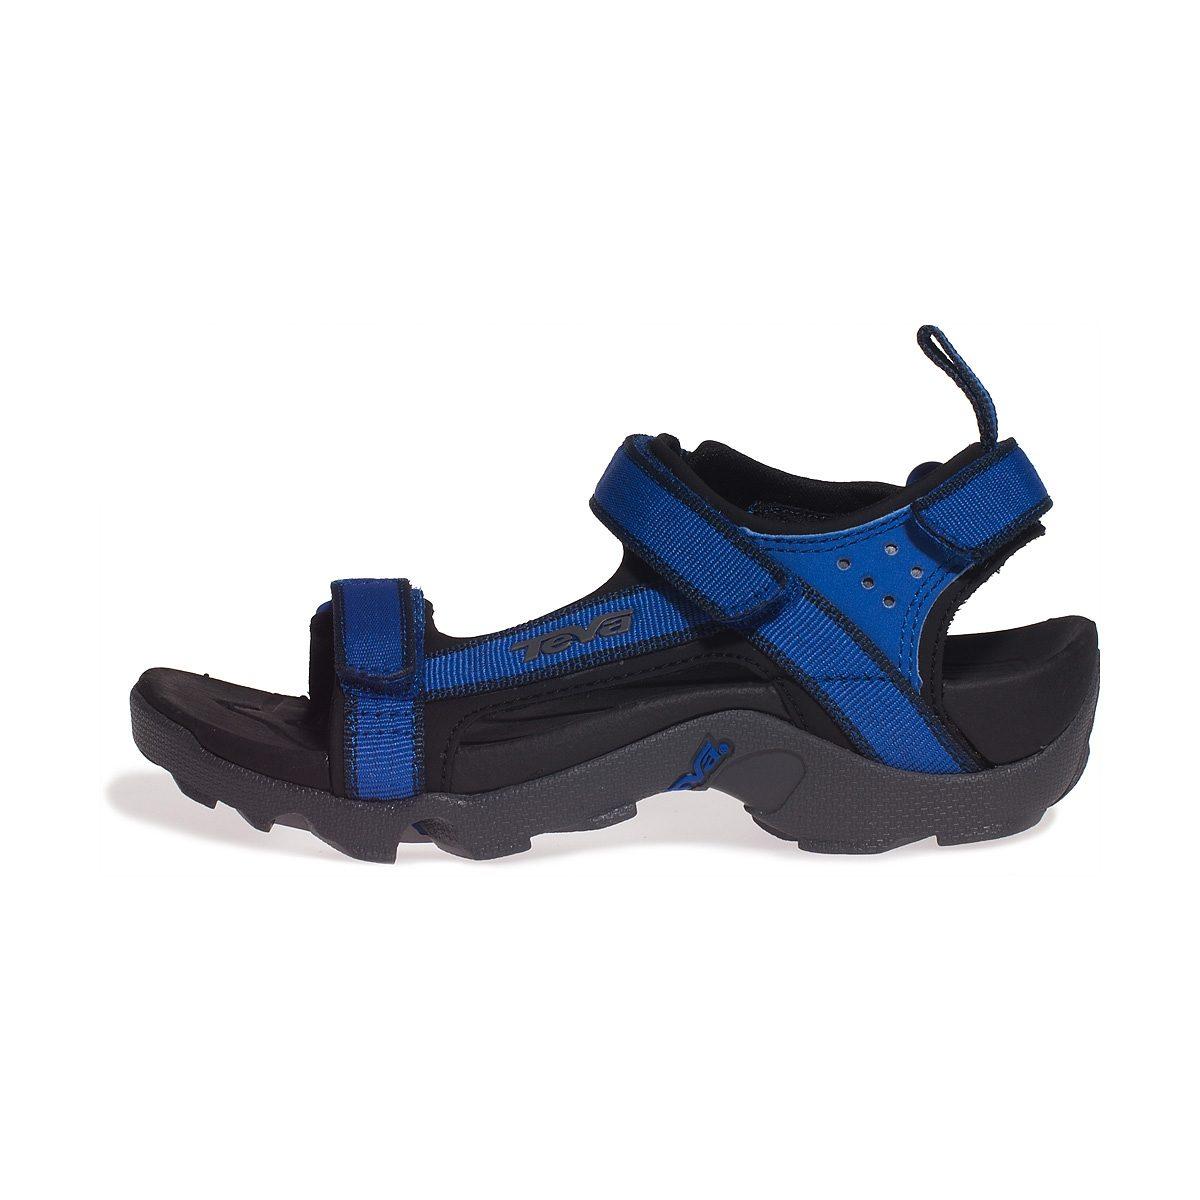 Teva Sandalen »Tanza Sandals Children Blue/Grey«